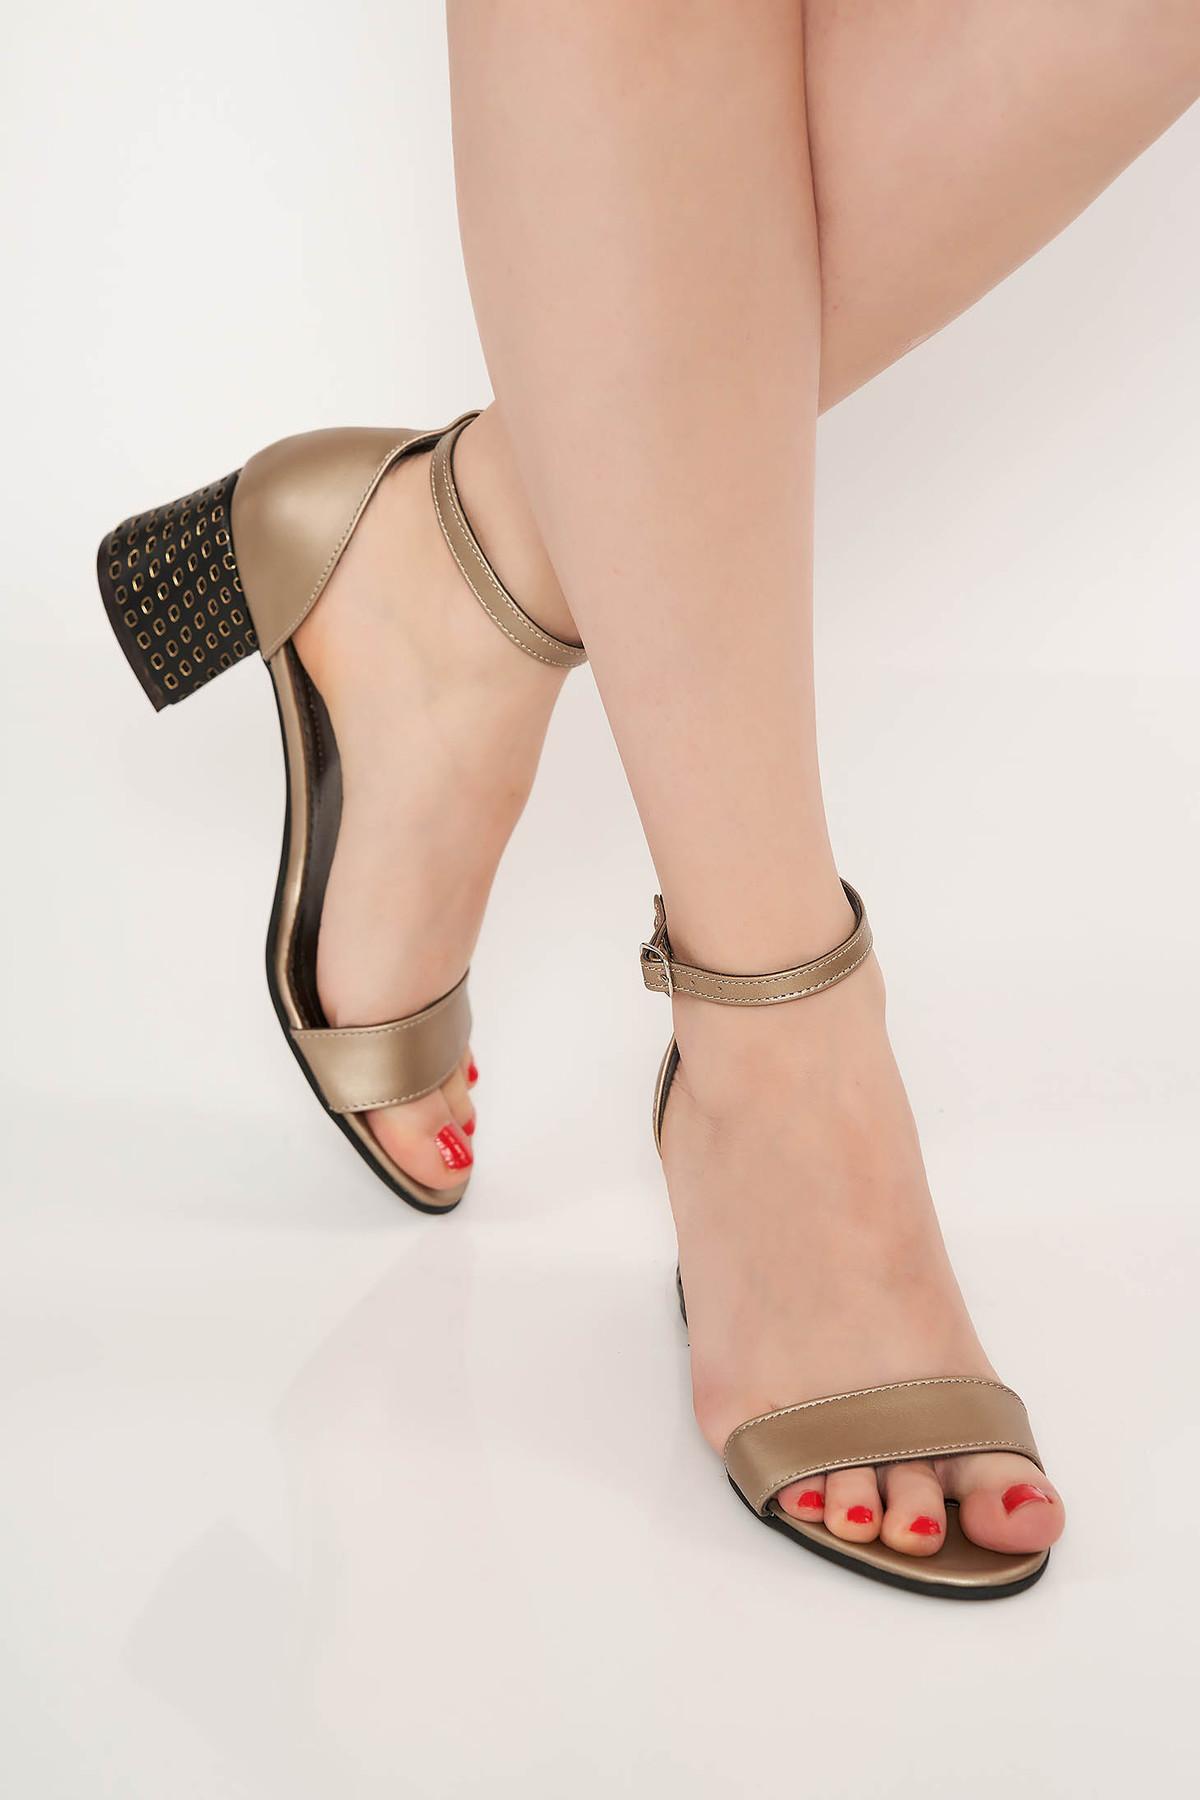 Sandale gri inchis elegante din piele naturala cu toc gros